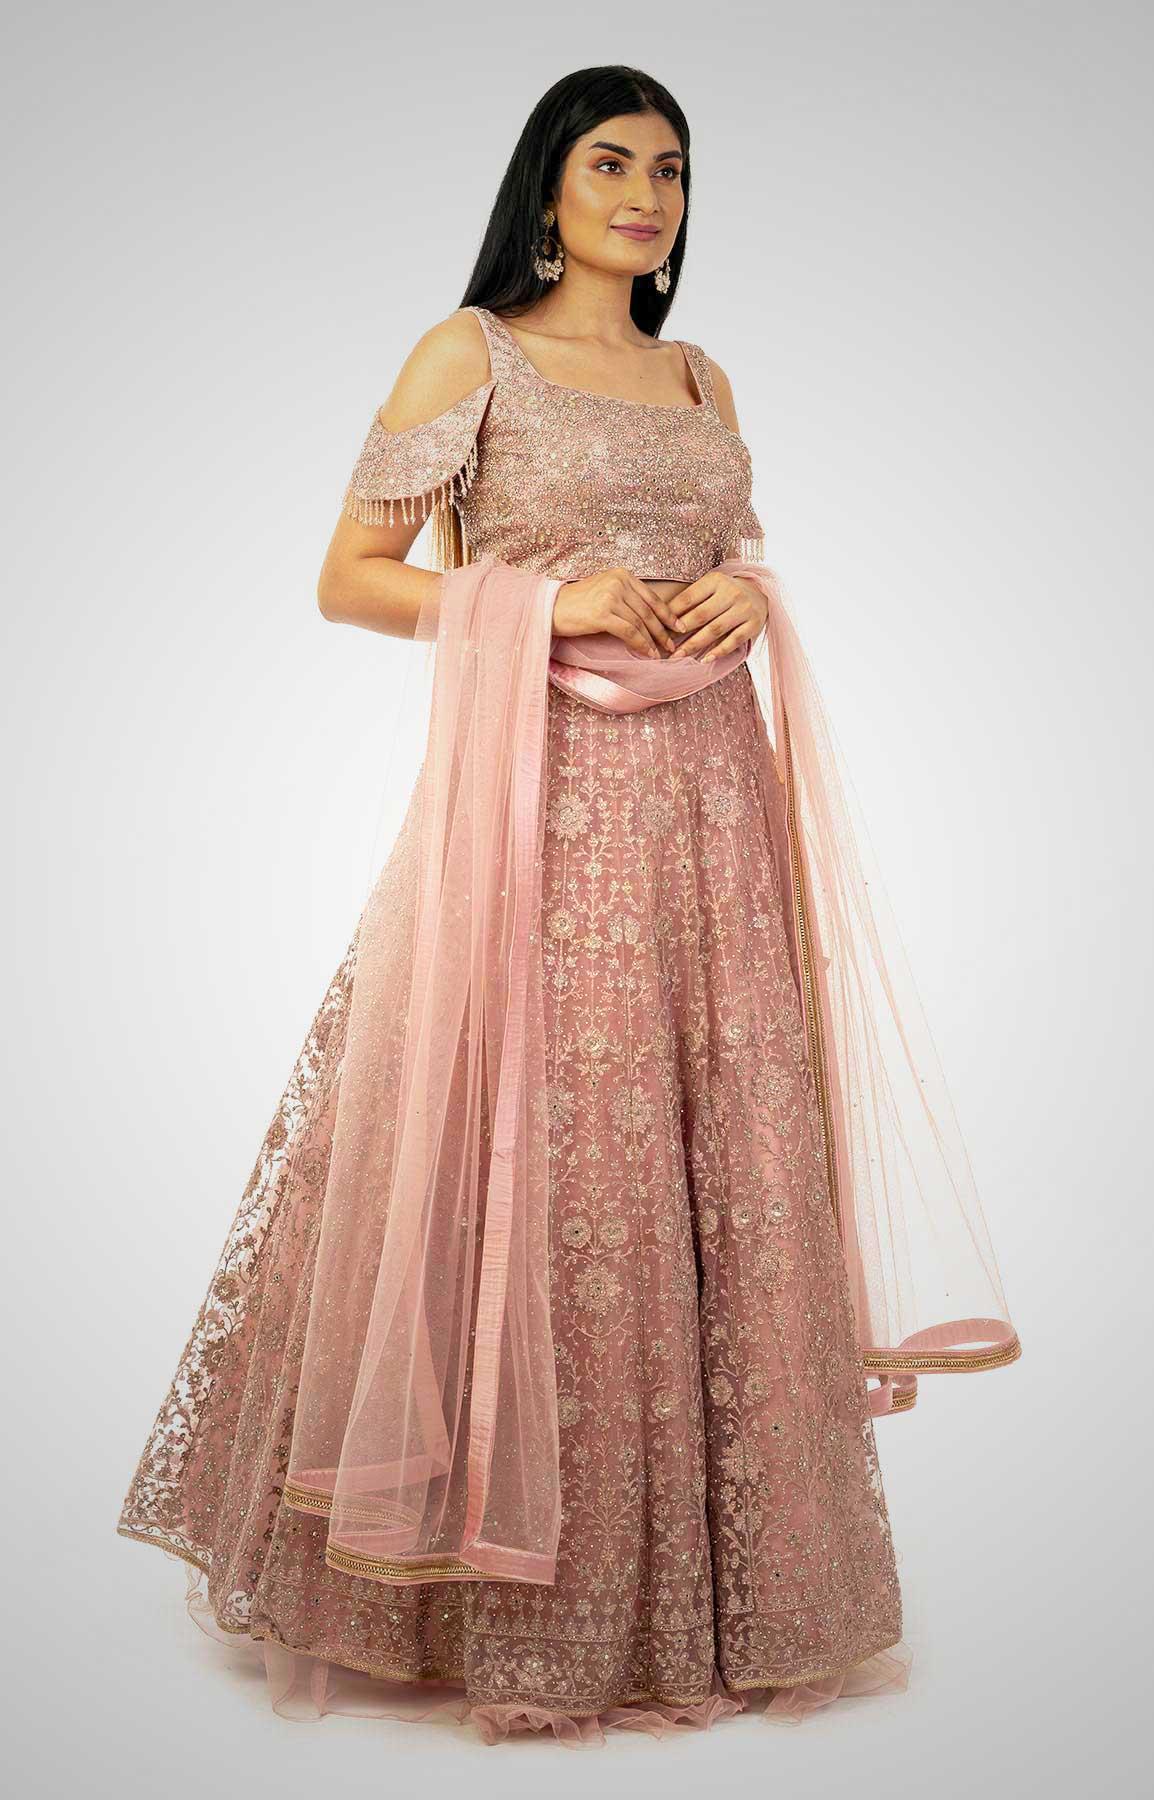 Onion Pink Net Lehenga  With Heavy Embroidery – Viraaya By Ushnakmals